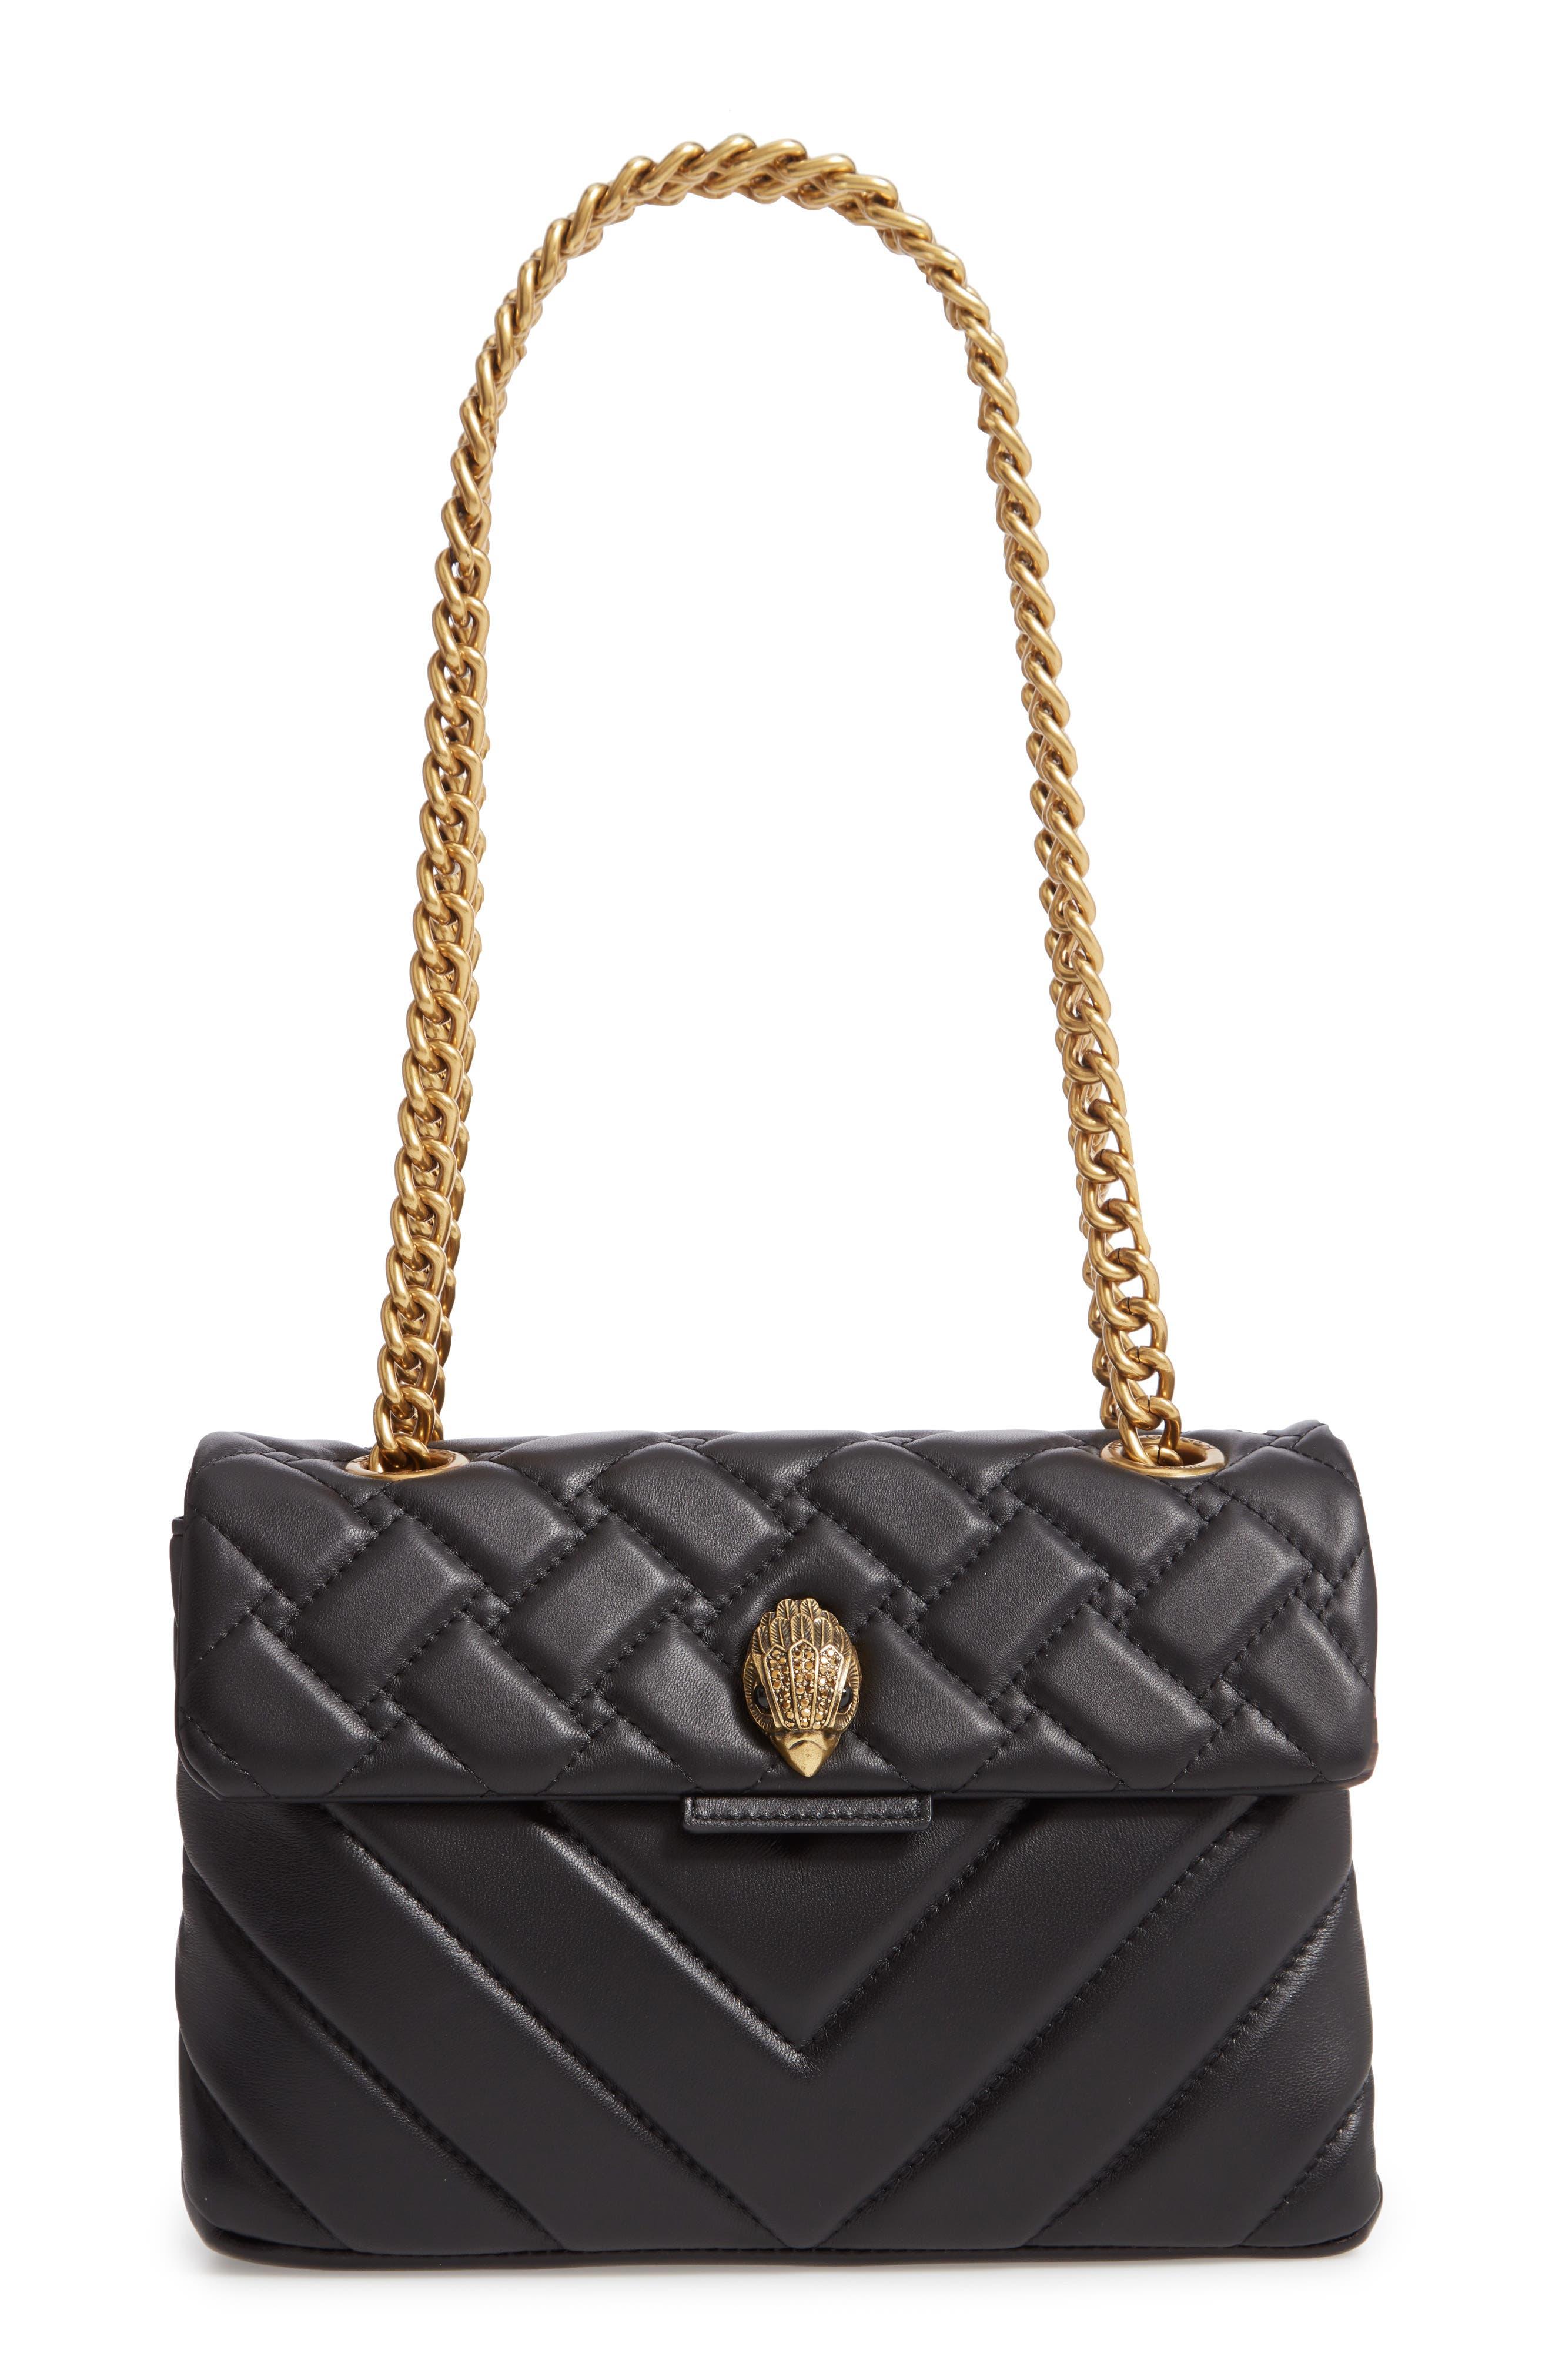 KURT GEIGER LONDON,                             Kensington Quilted Leather Shoulder Bag,                             Main thumbnail 1, color,                             BLACK